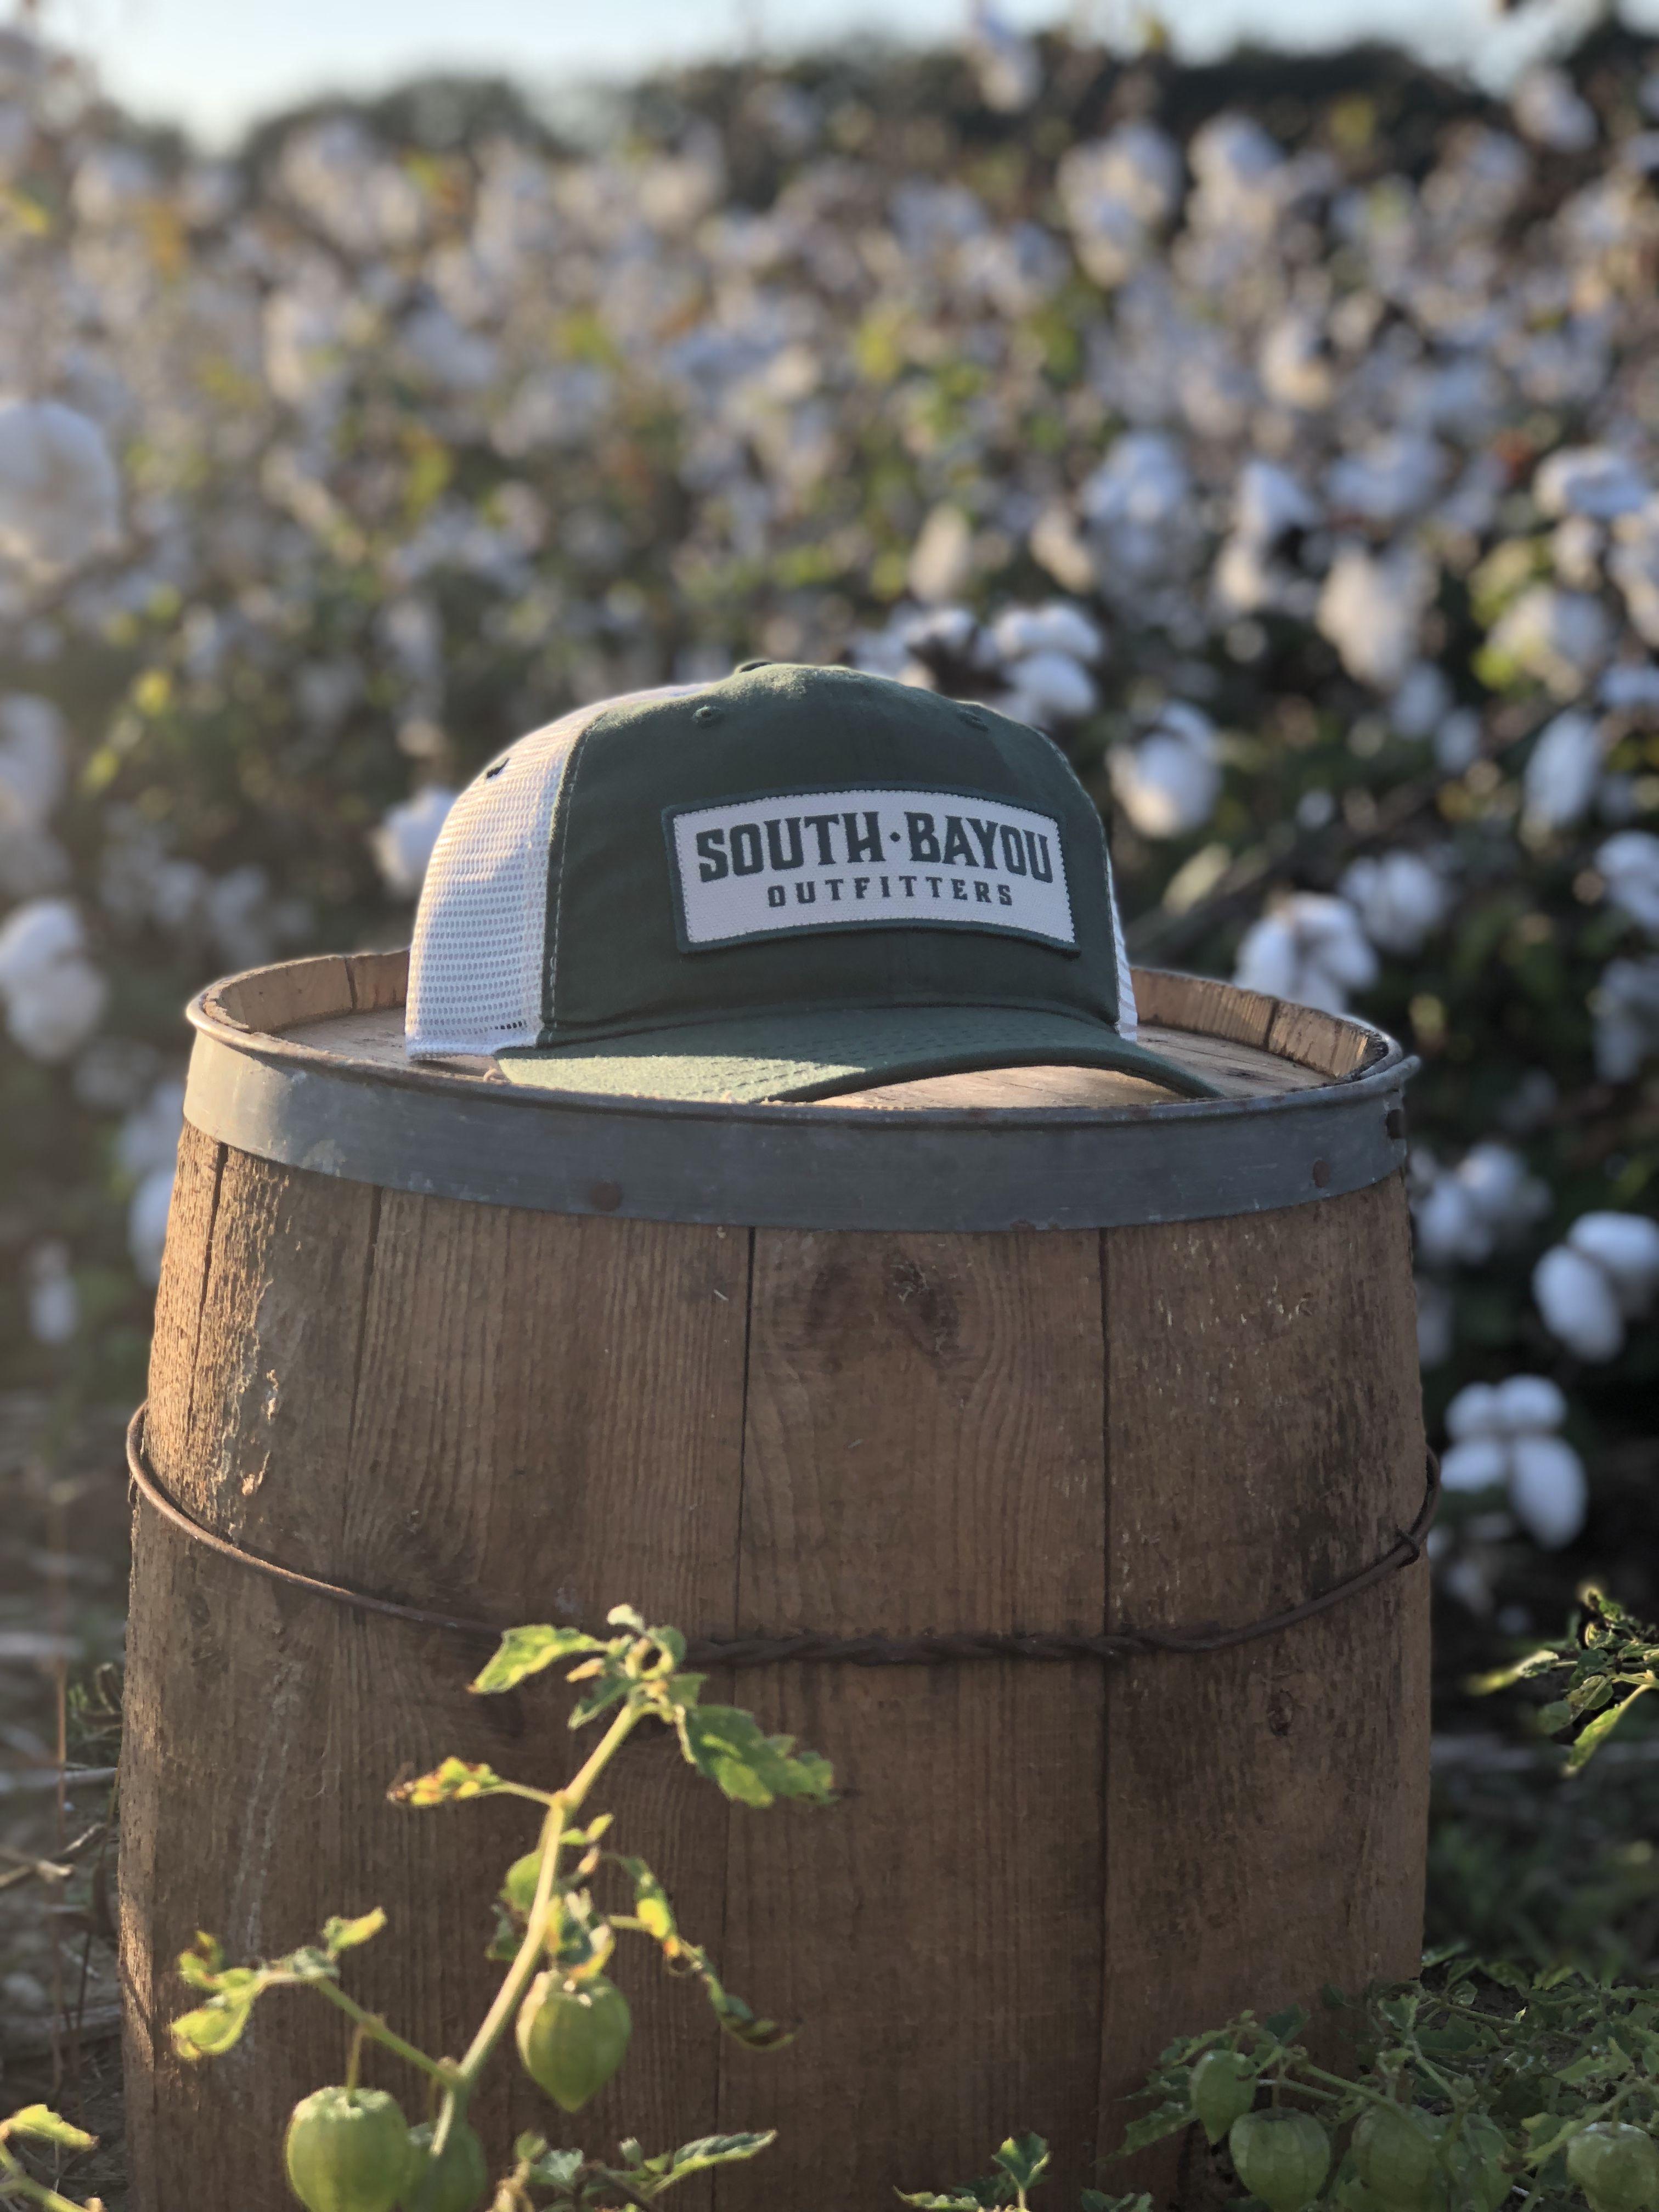 c26e231cd76 Southbayou hats headwear SnapBack southern apparel cotton field farm  country outdoor